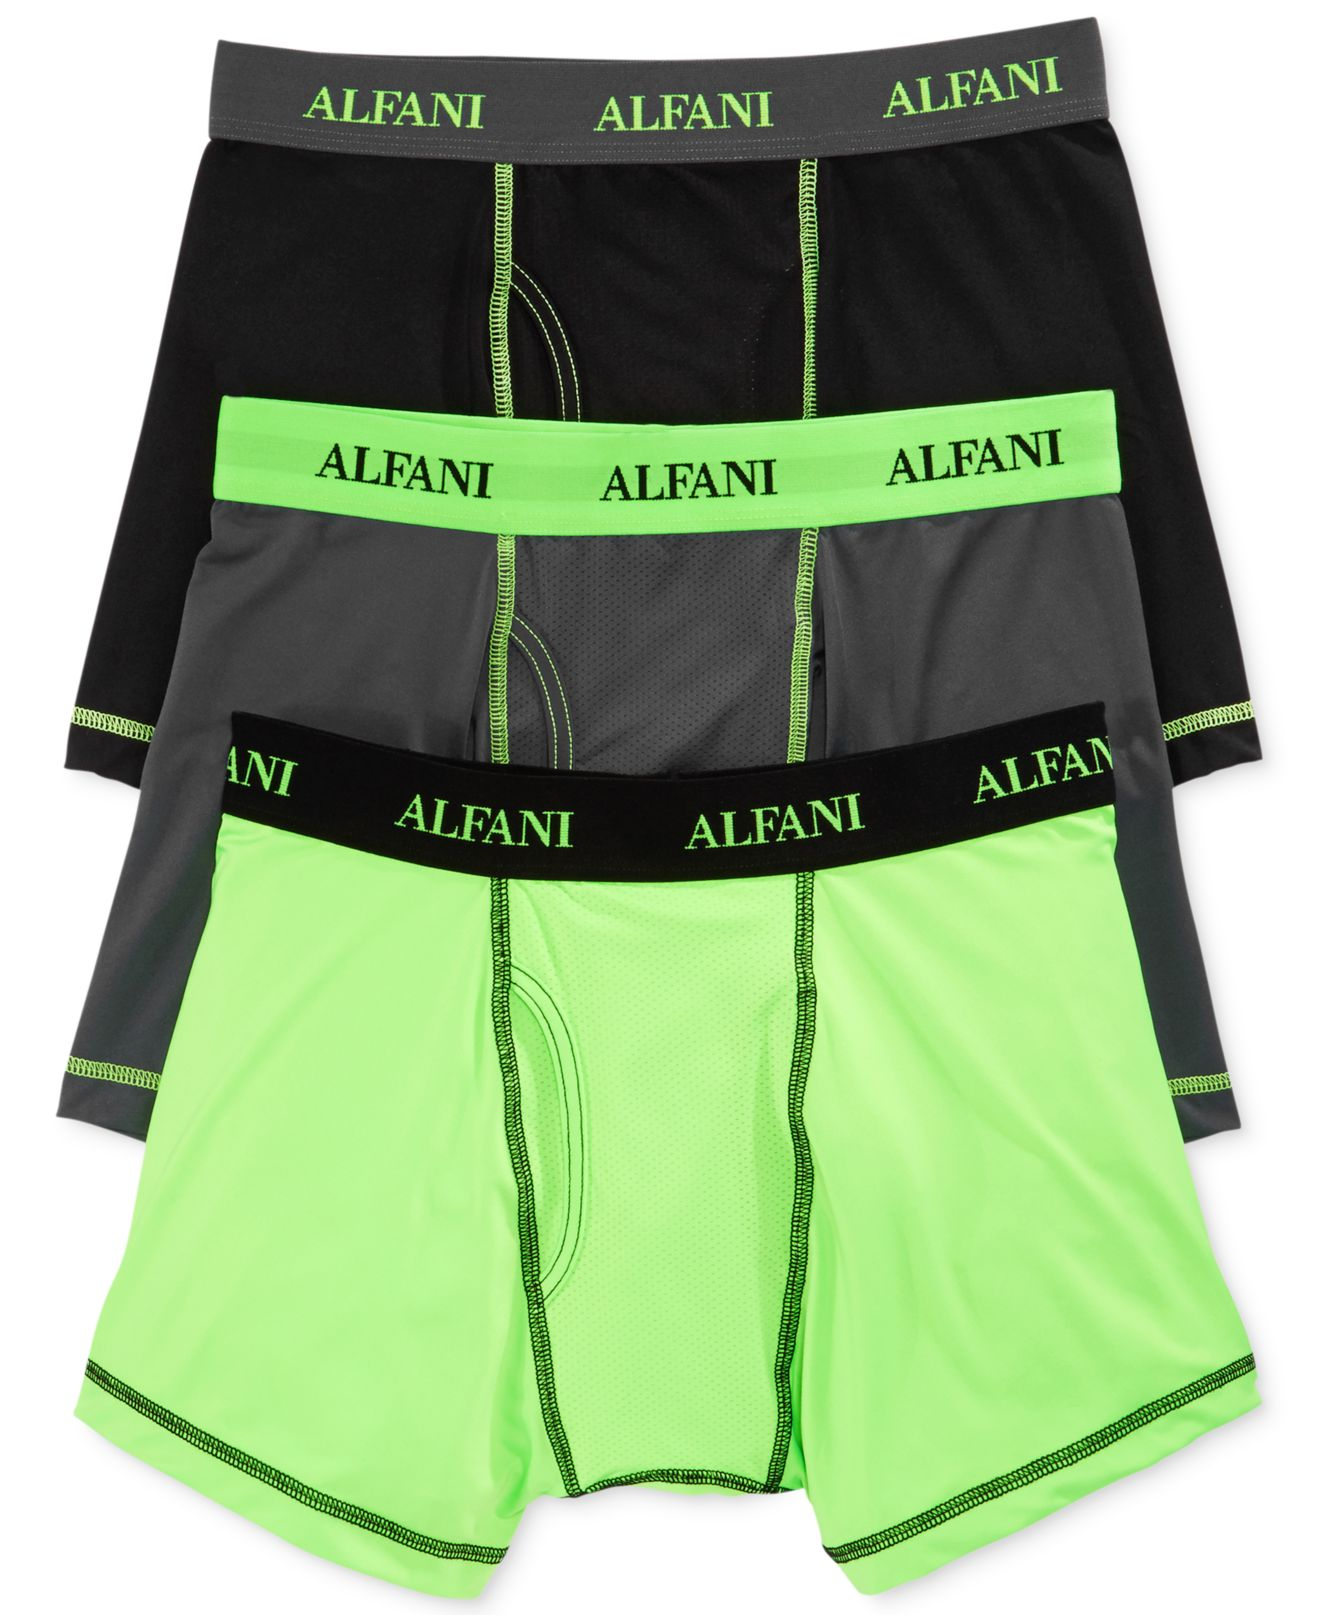 95e4c1a3718d Lyst - Alfani Men s Athletic Boxer Briefs 3-pack in Green for Men